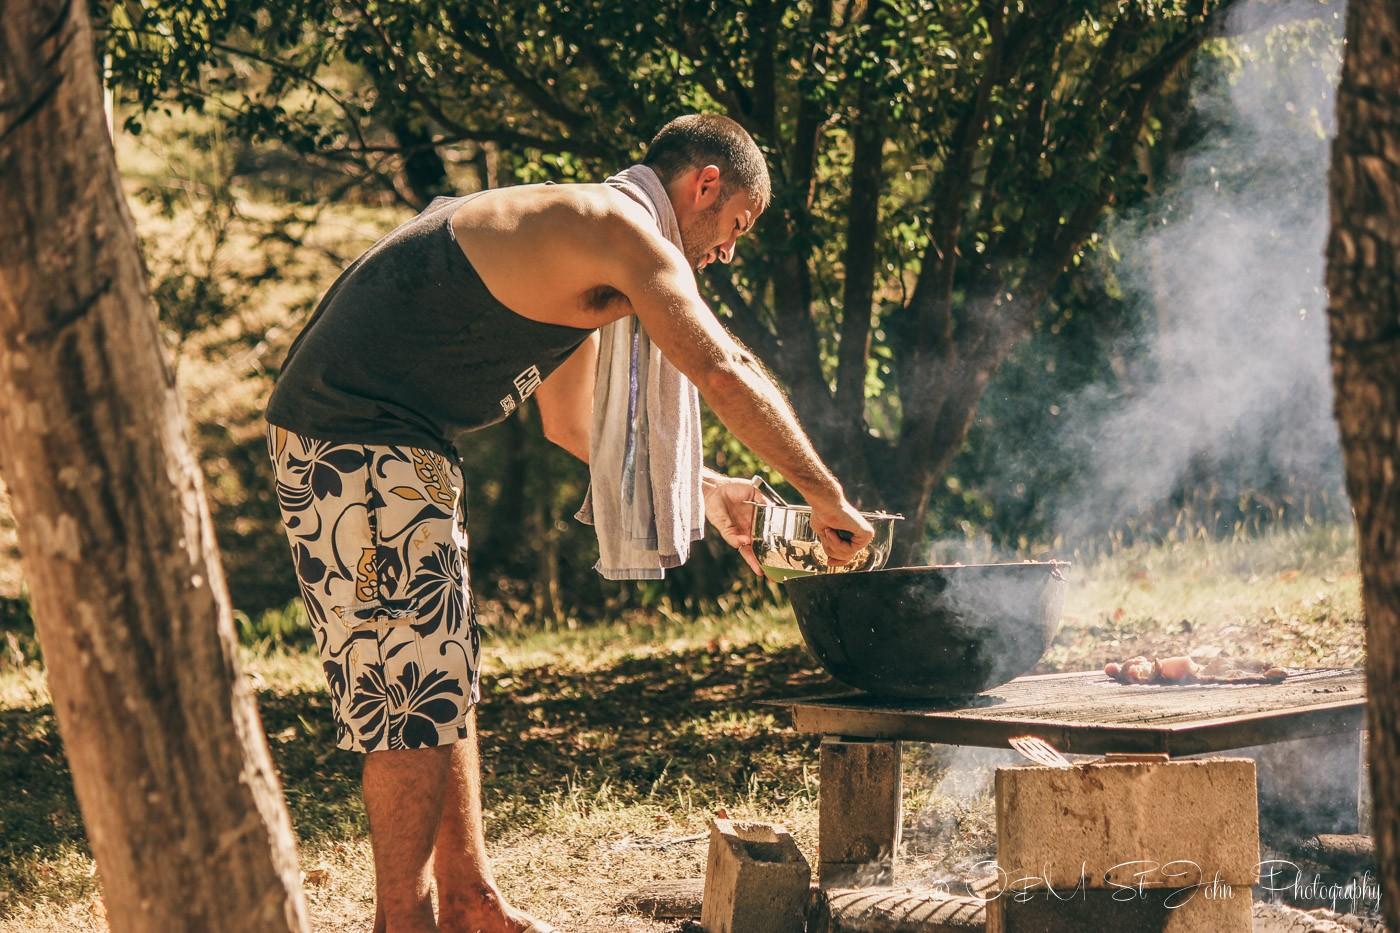 Max cooking gallo pinto in Costa Rica